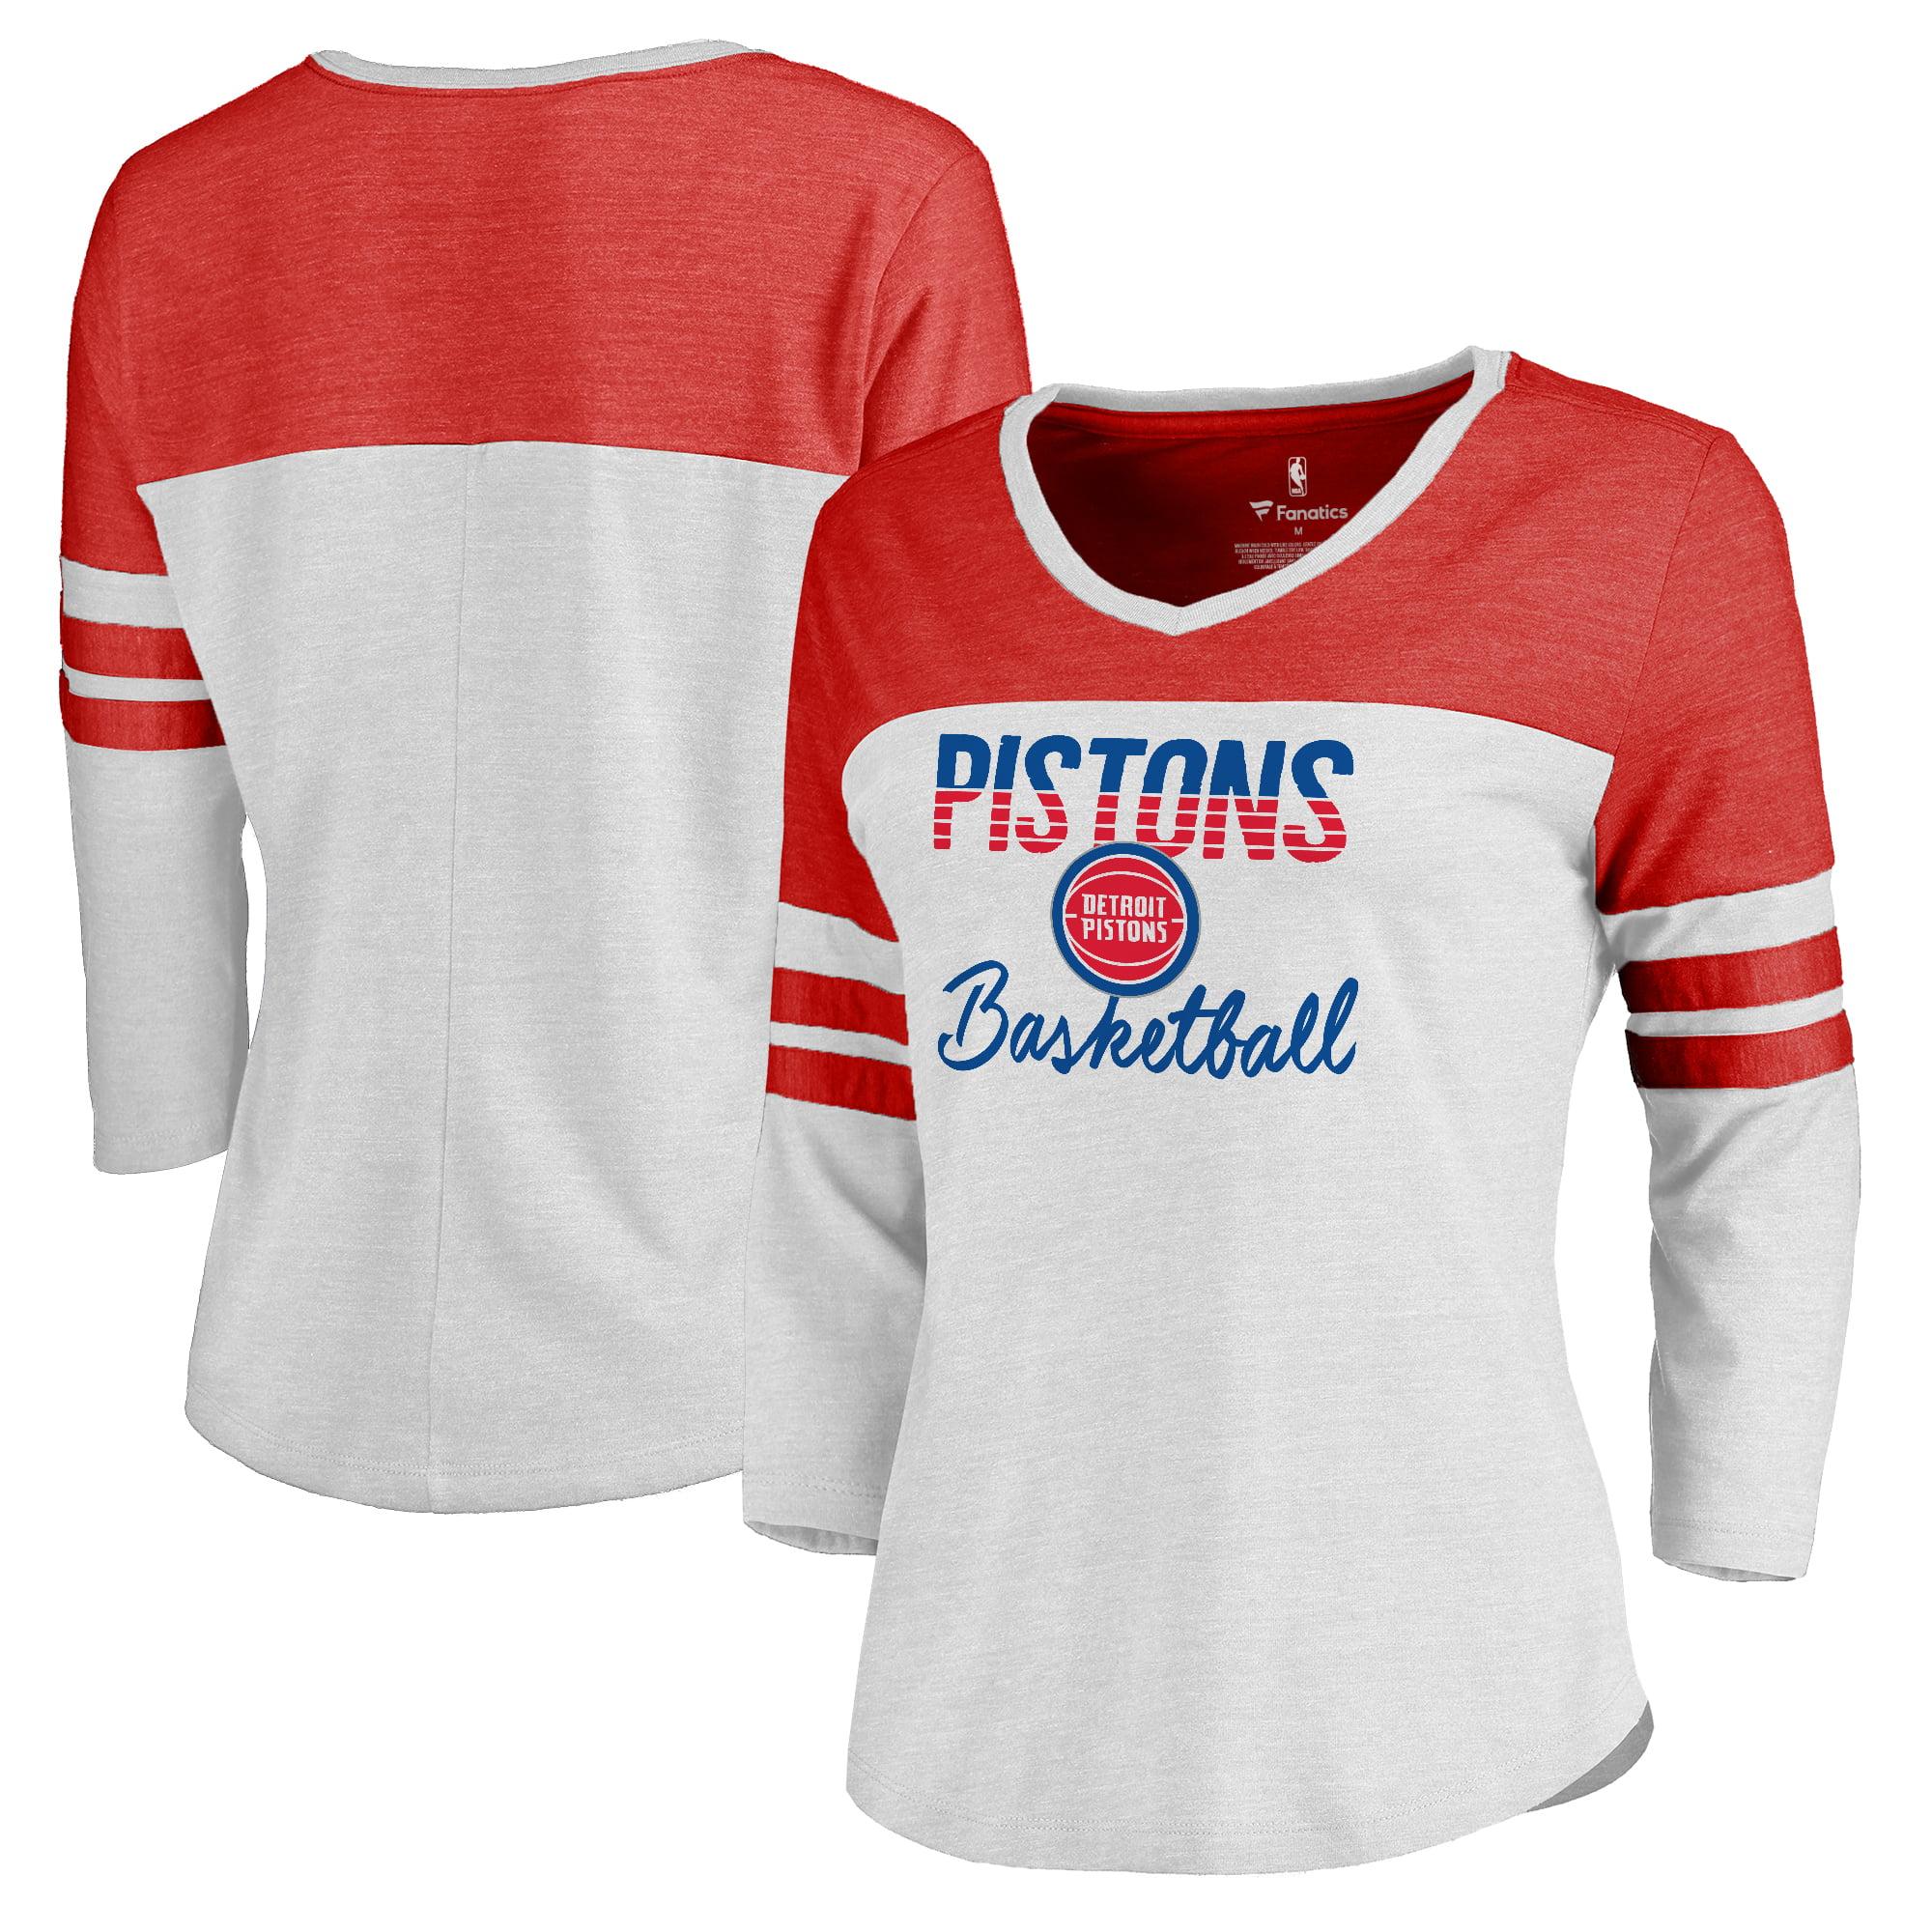 Detroit Pistons Fanatics Branded Women's Plus Size Free Line Color Block 3/4-Sleeve Tri-Blend T-Shirt - White/Red